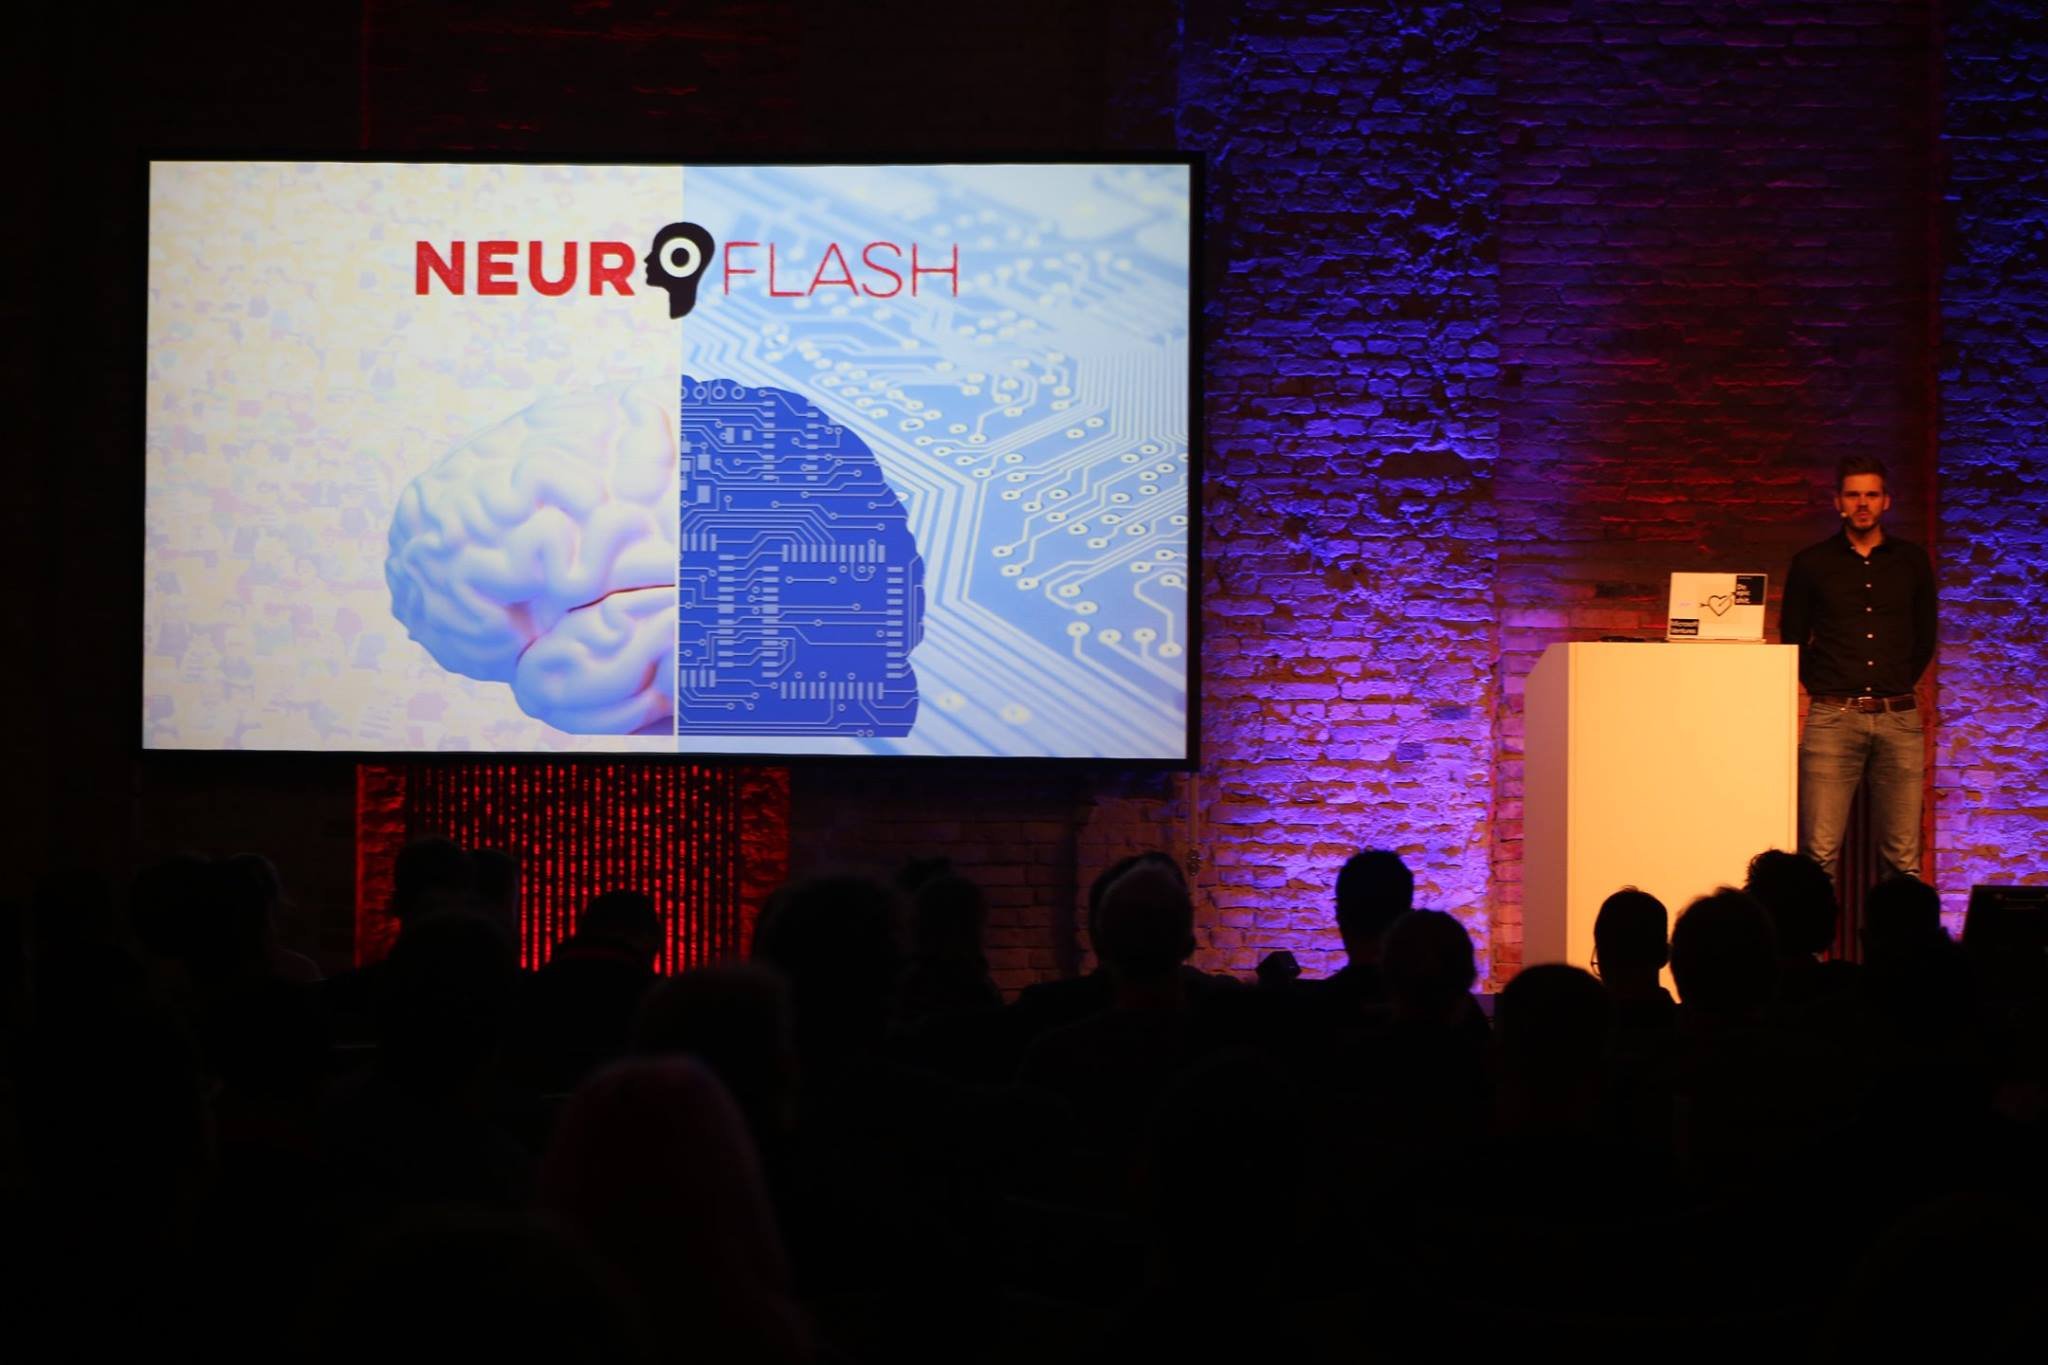 Neuroflash